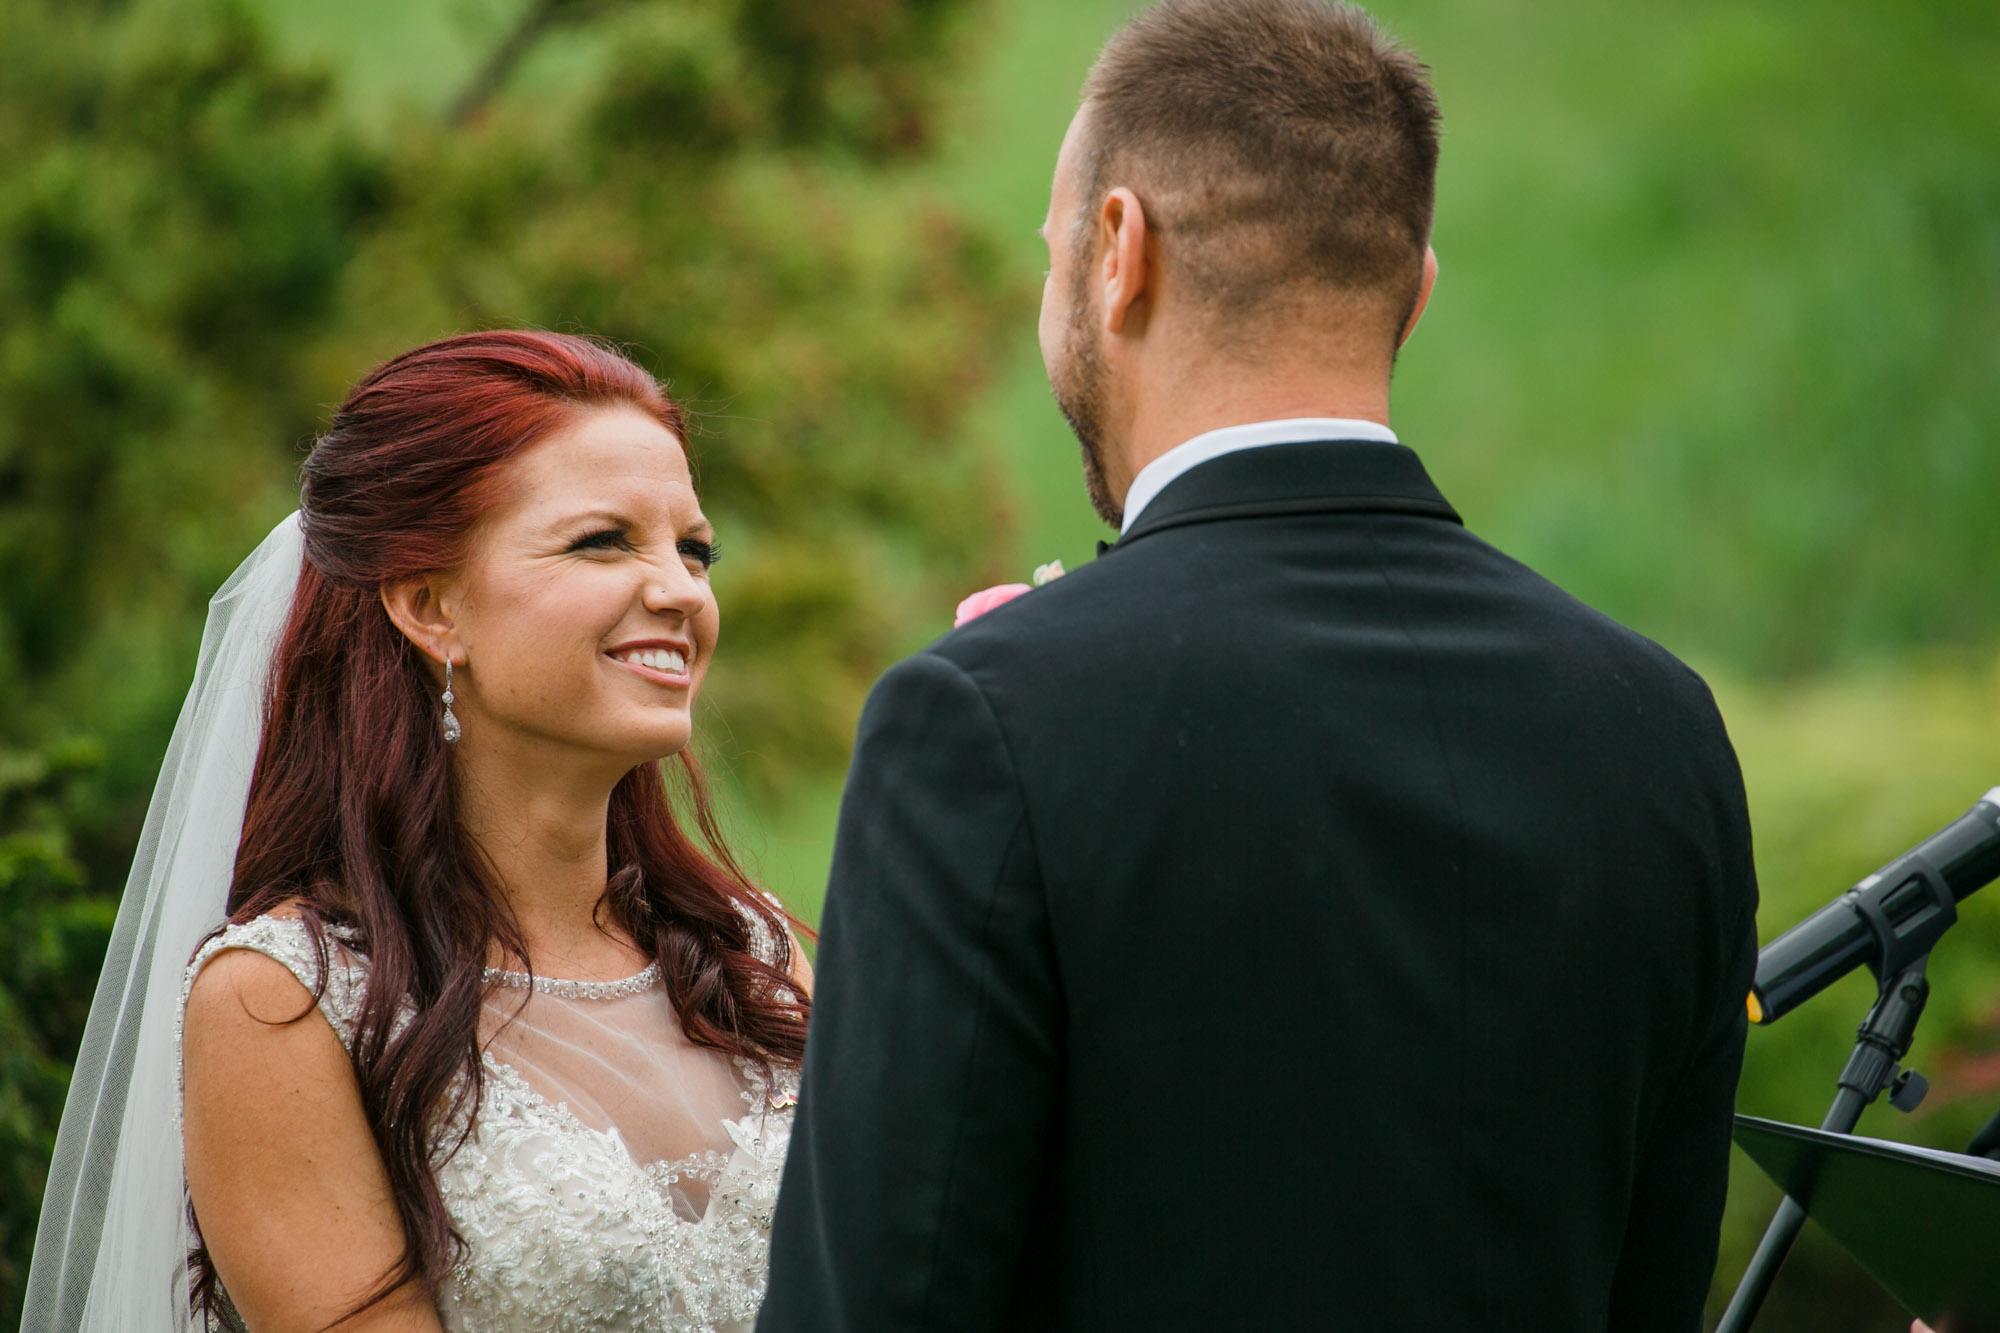 hensville-wedding-downtown-toledo-ohio (41 of 103).jpg